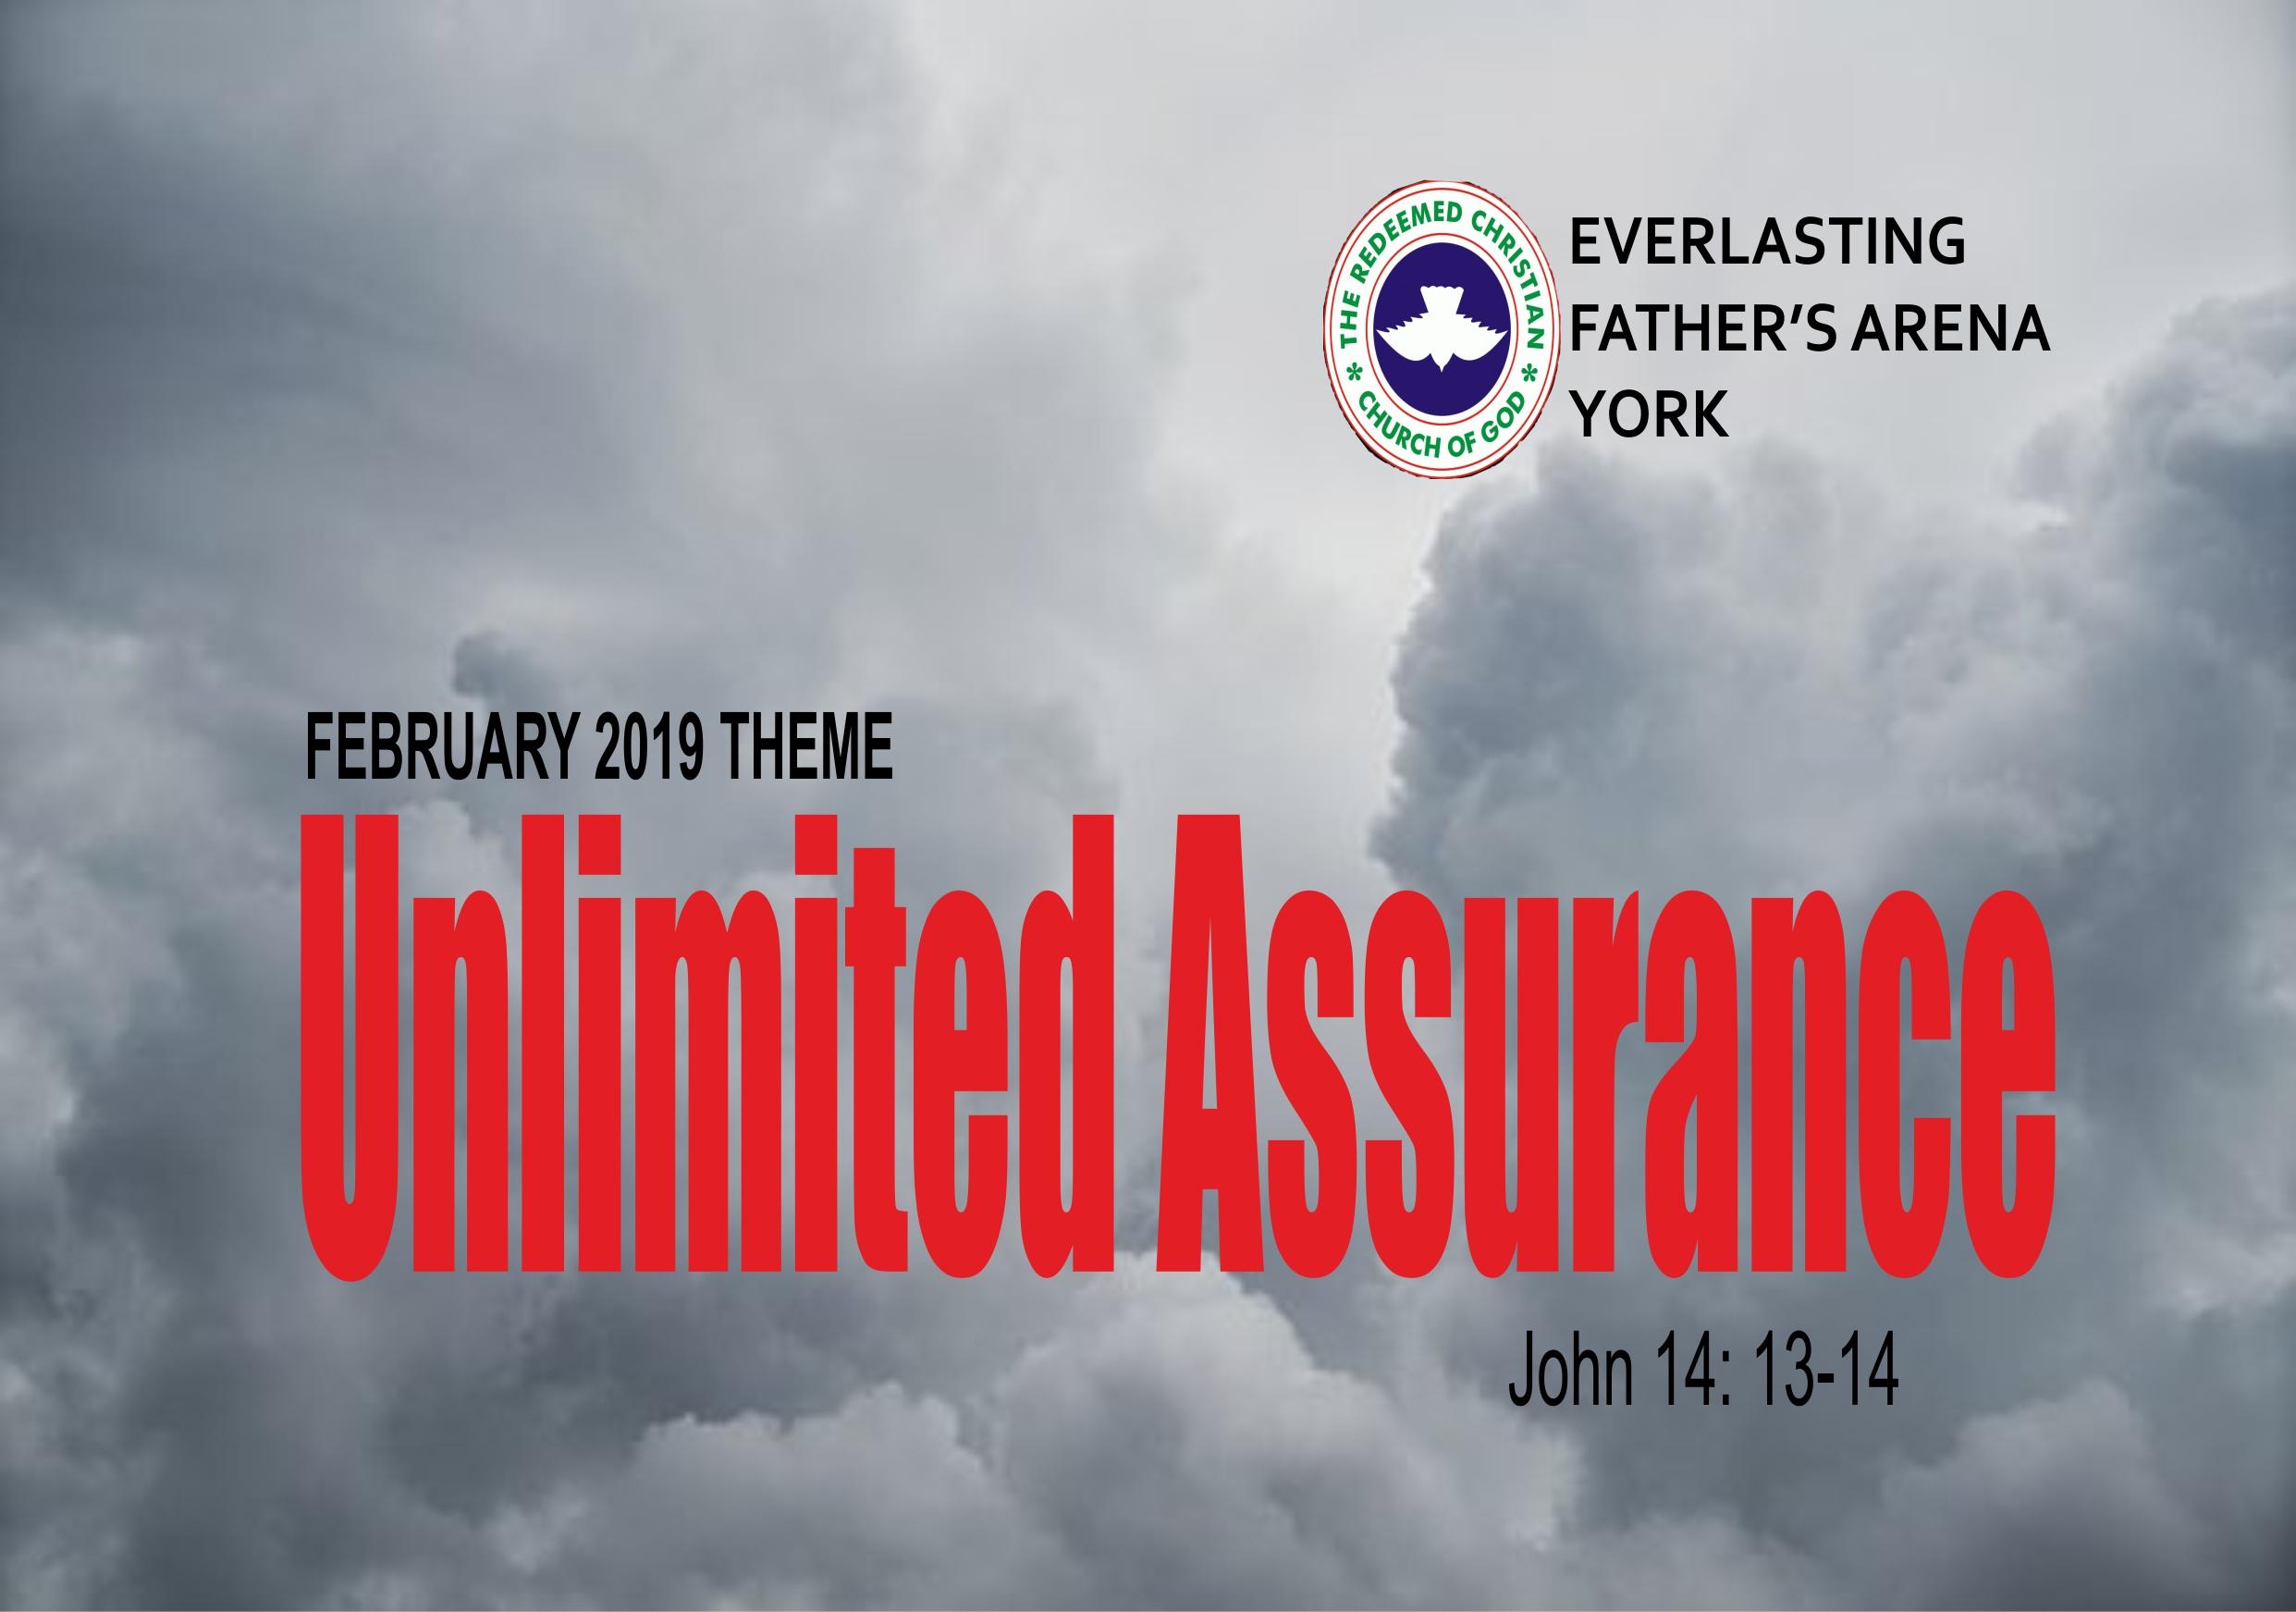 February 2019 Theme - Unlimited Assurance John 14:13-14